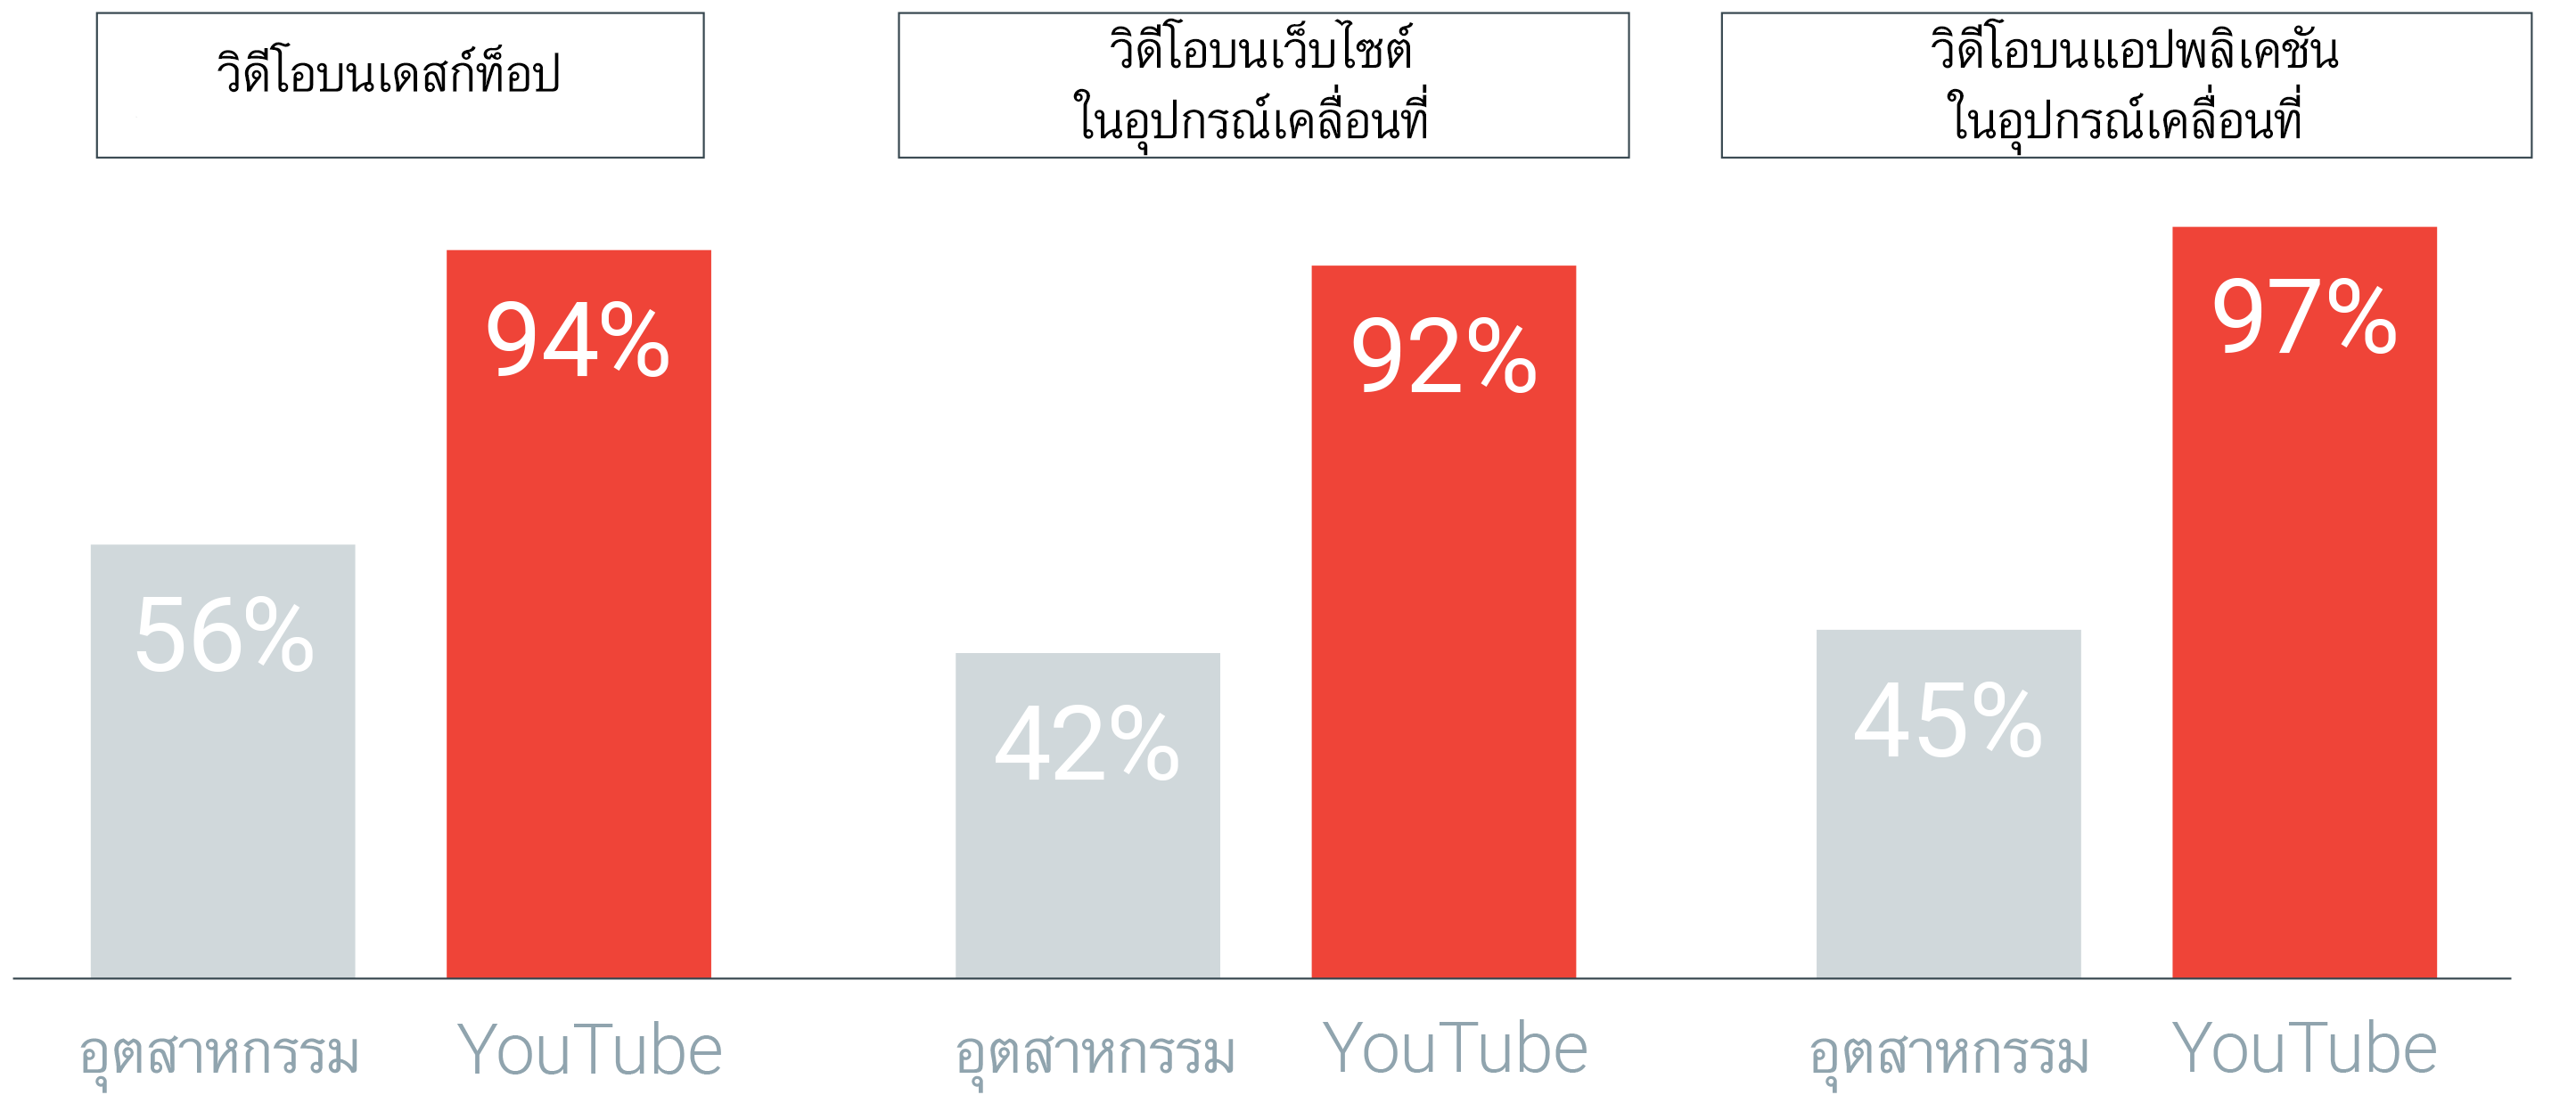 TWG_TH_2a_ThaiAttention_09051717-3